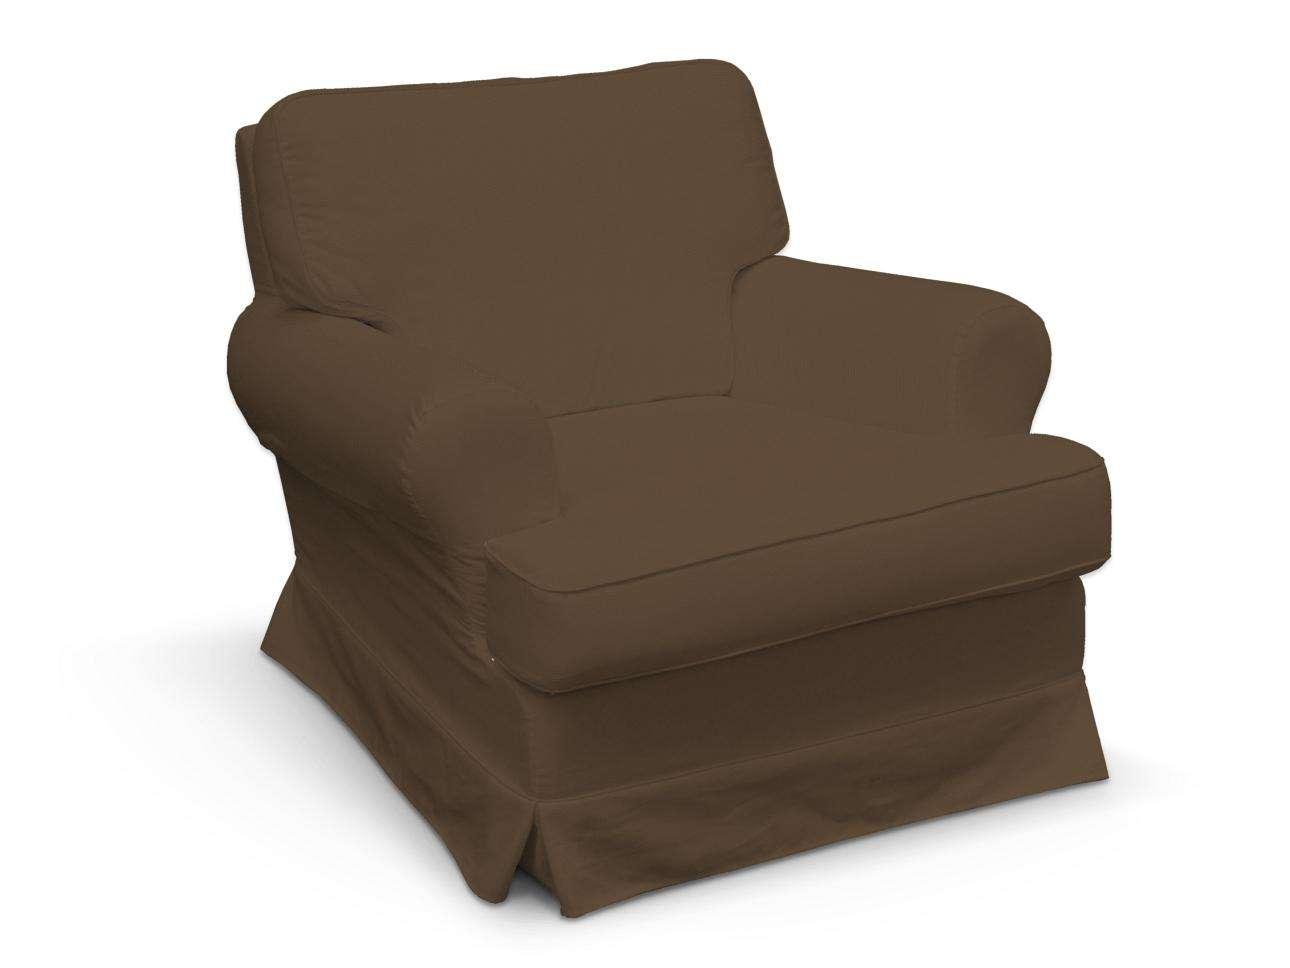 Barkaby Sesselbezug Sessel  Barkaby von der Kollektion Cotton Panama, Stoff: 702-02